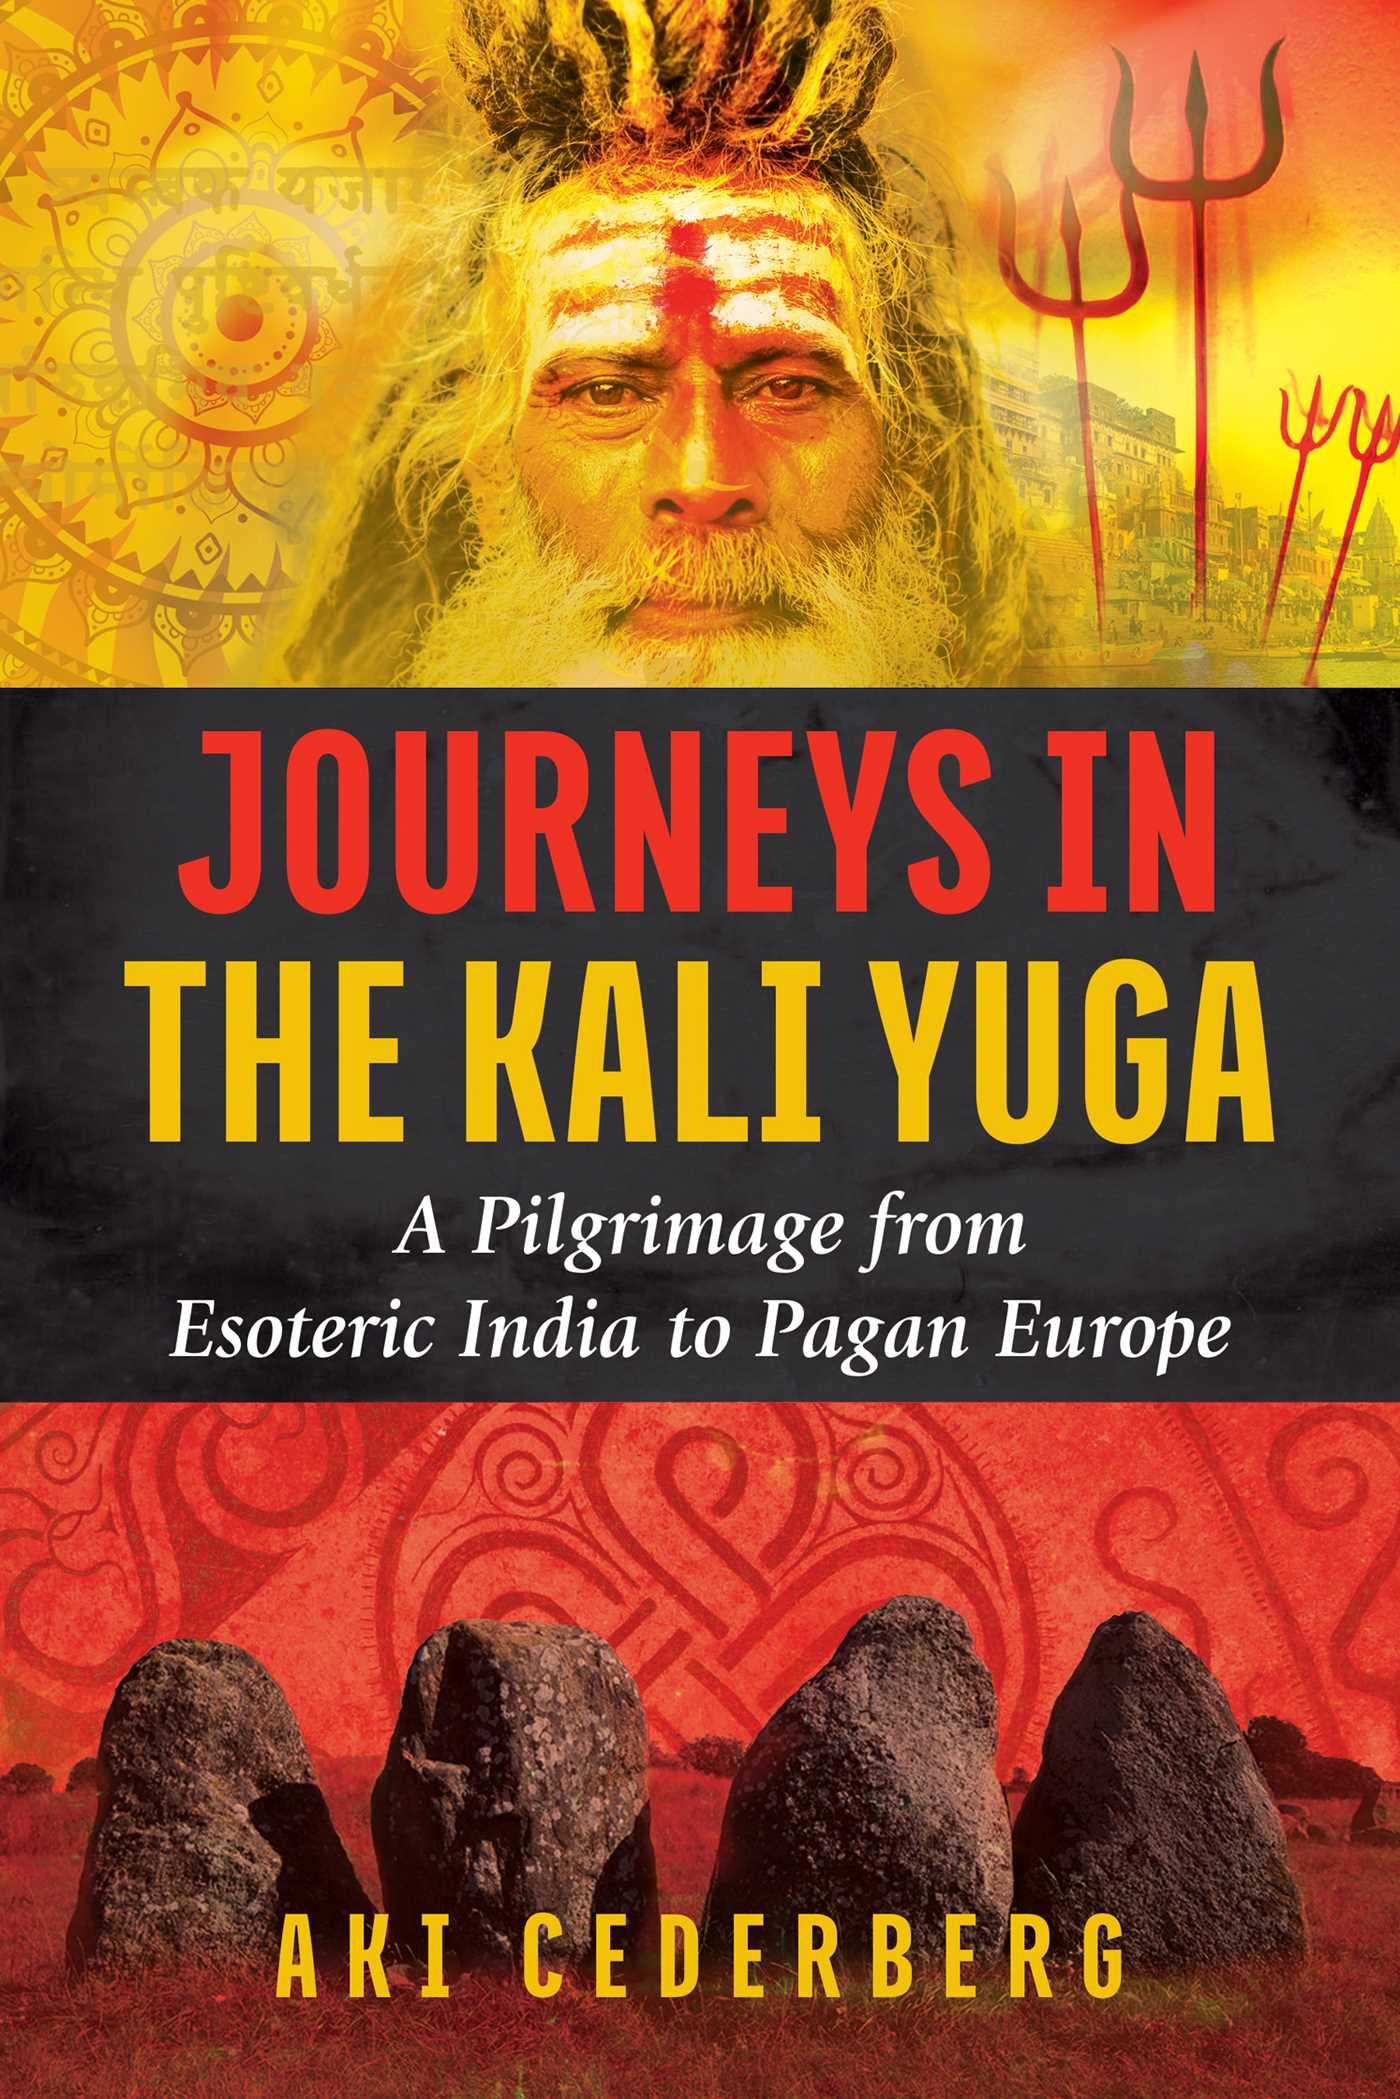 Journeys in the kali yuga 9781620556801 hr